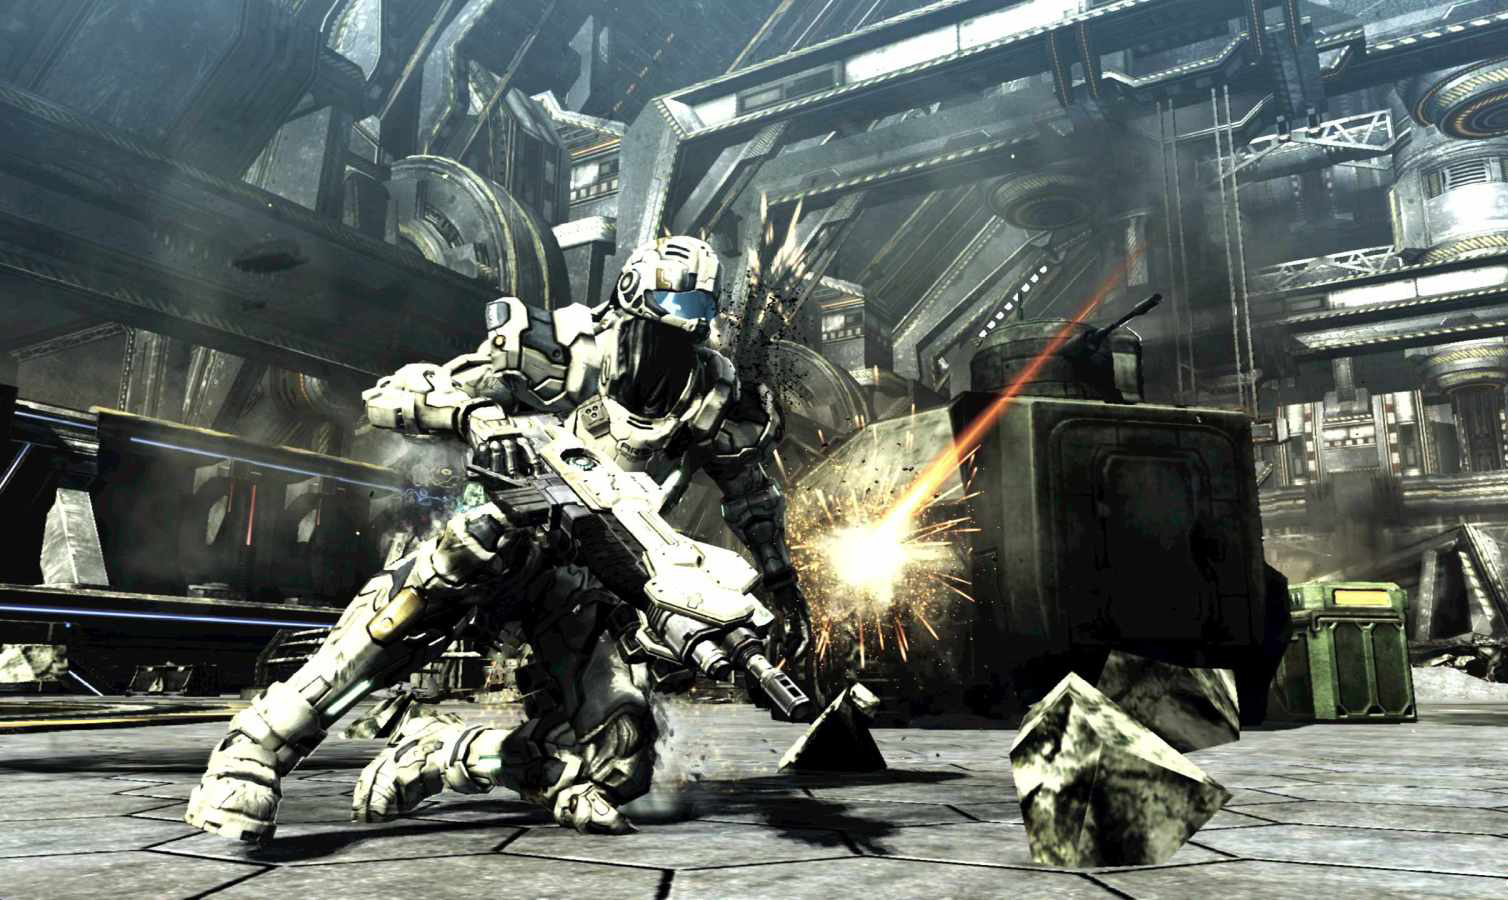 E3 2015: Vanquish 2 may well be Platinum's new game